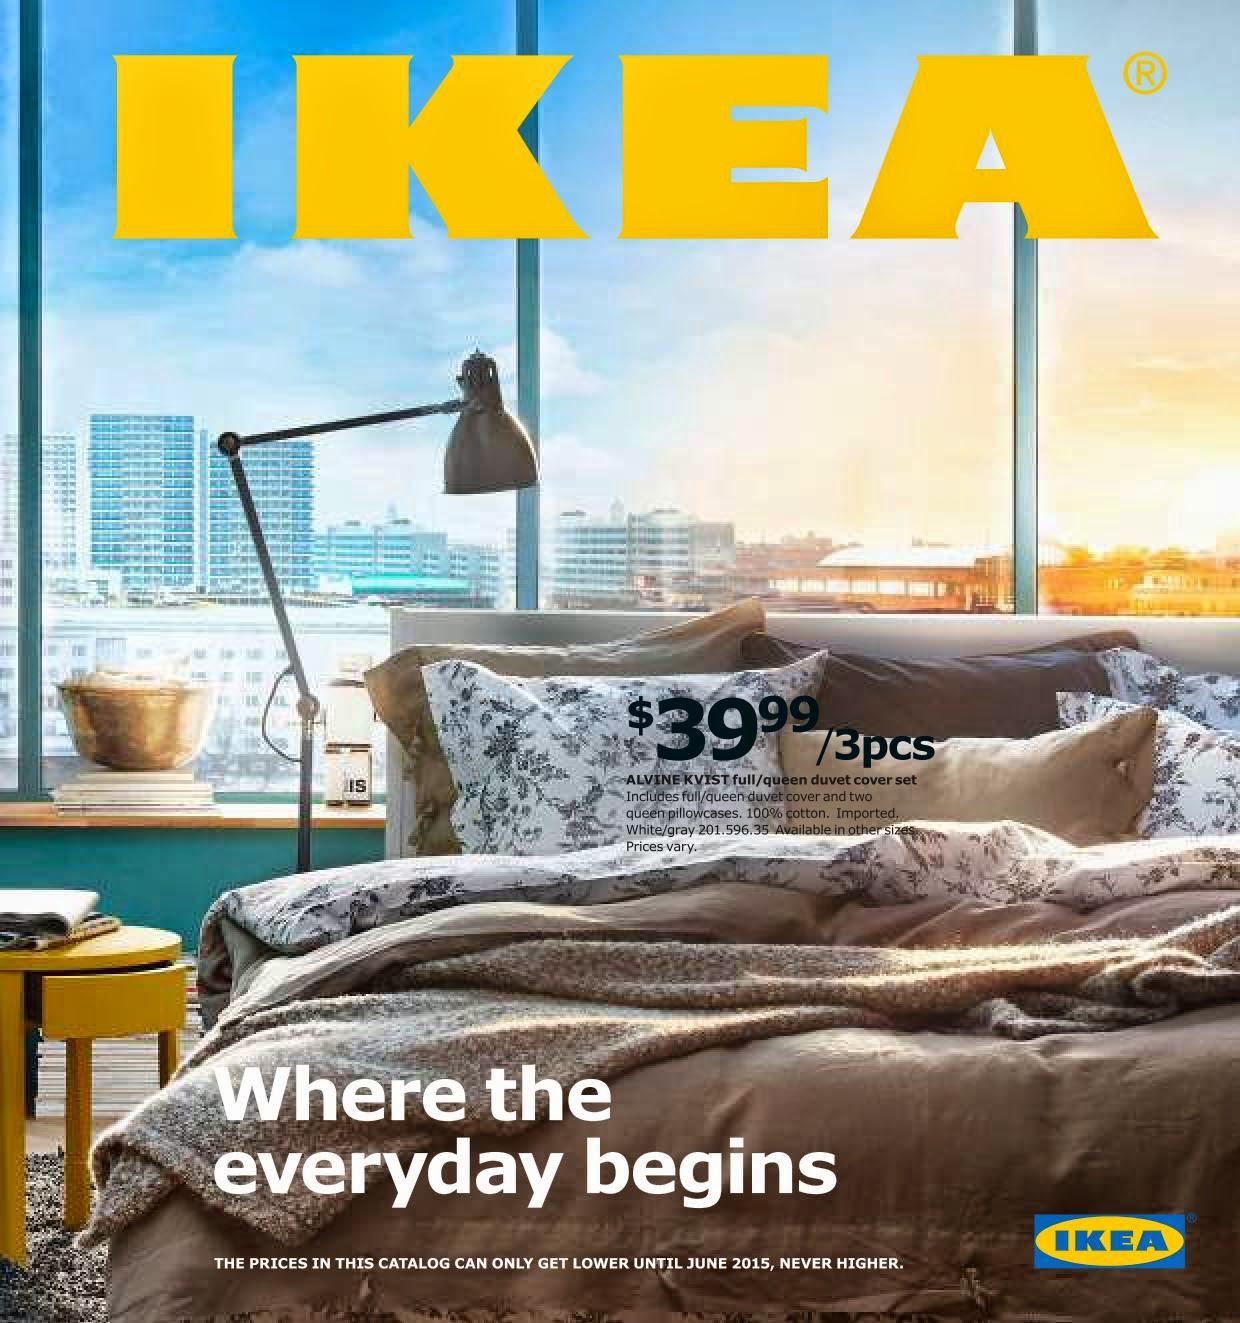 Ikea Usa All Products: I K E A Catalogs & Brochures Online